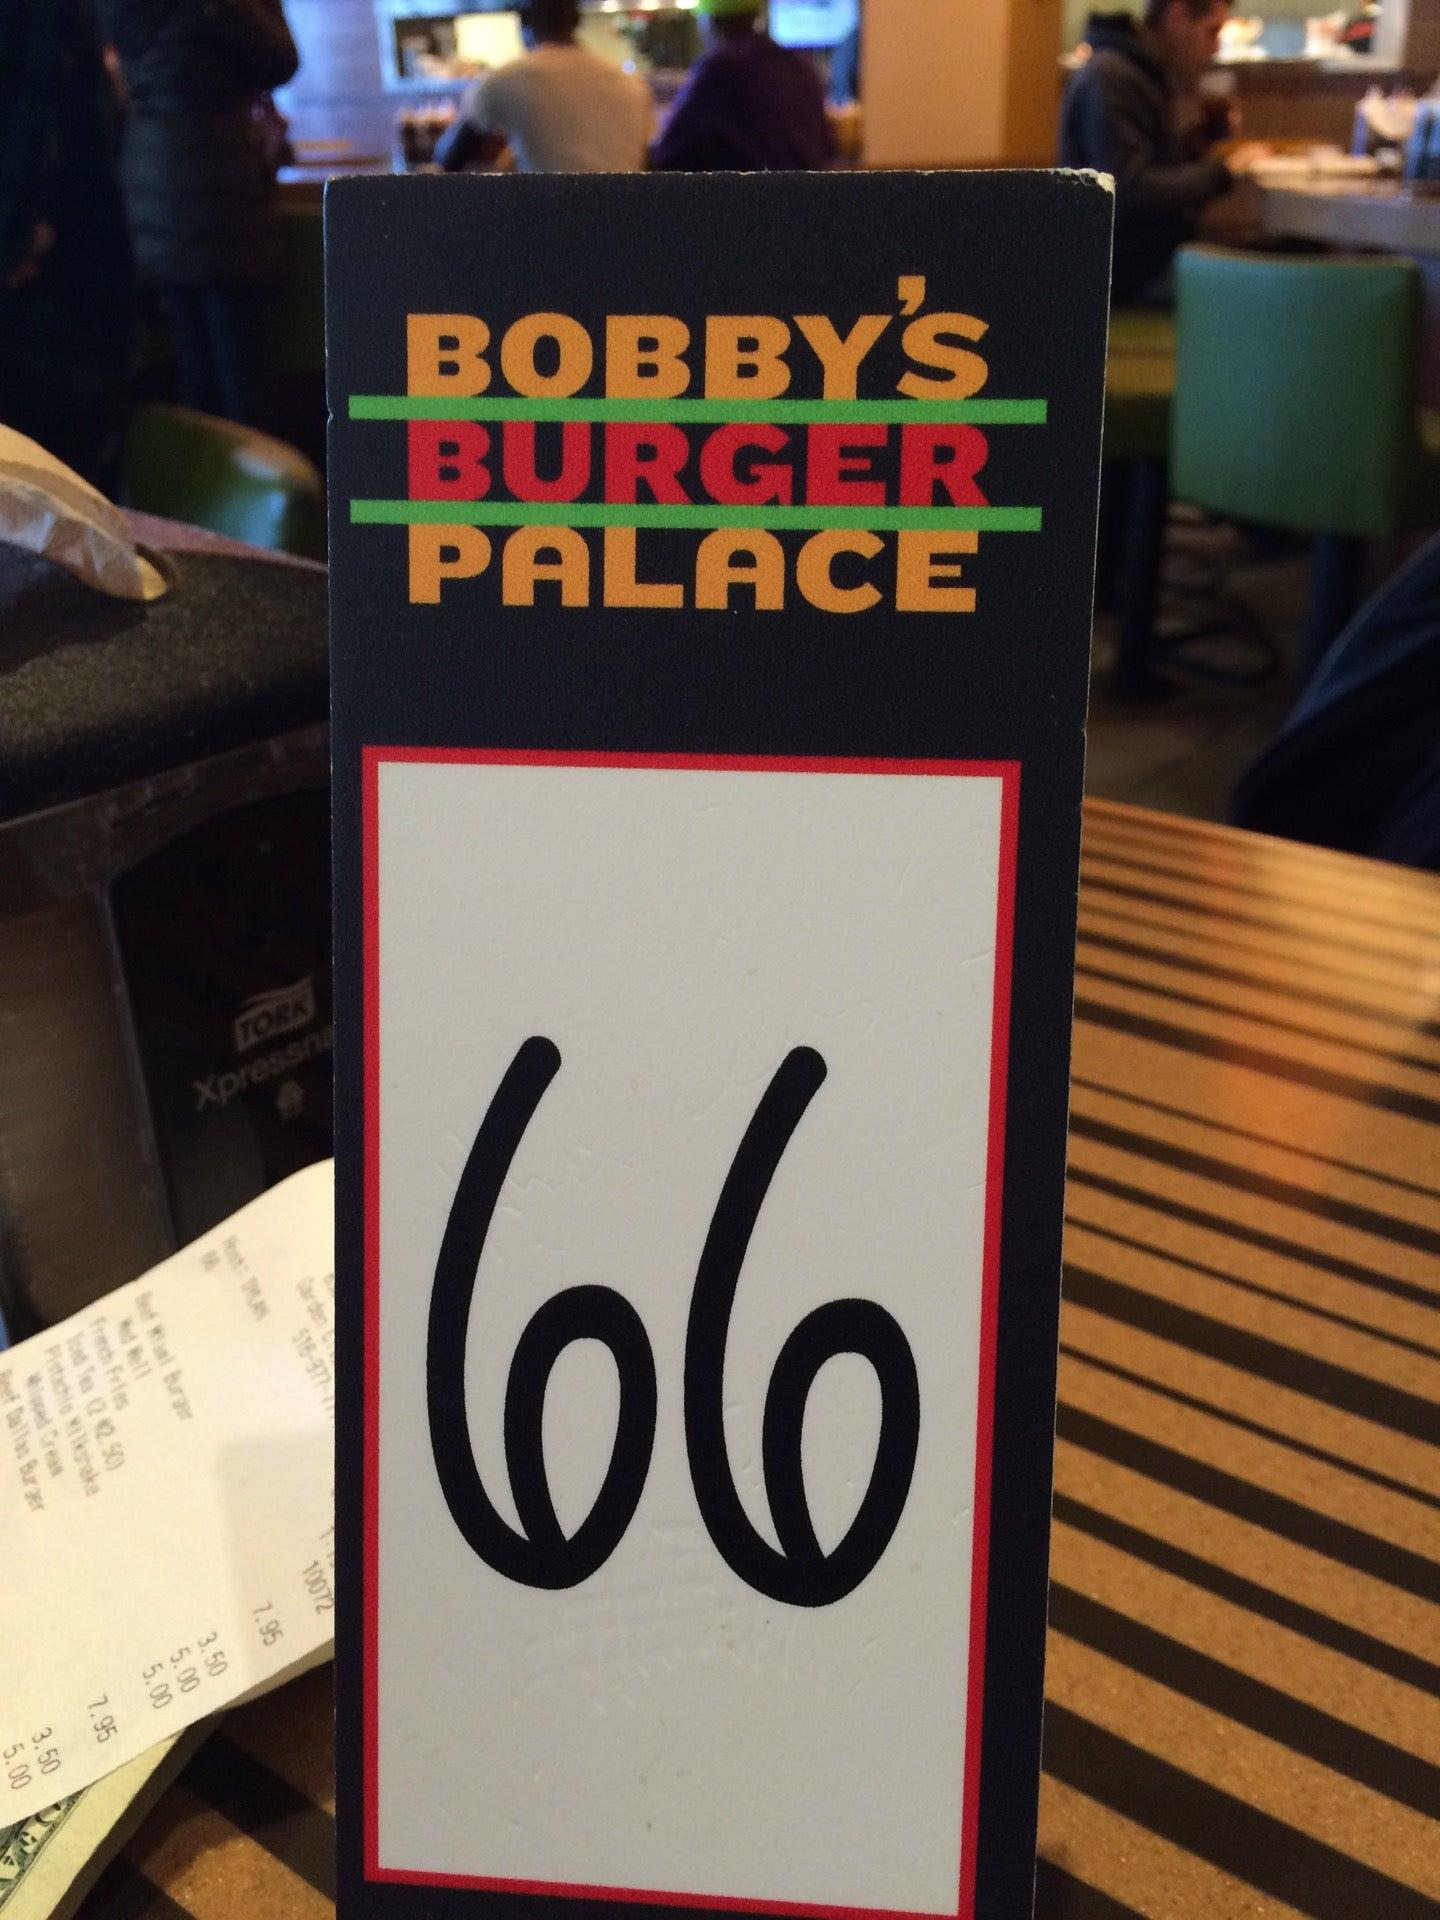 BOBBY'S BURGER PALACE,